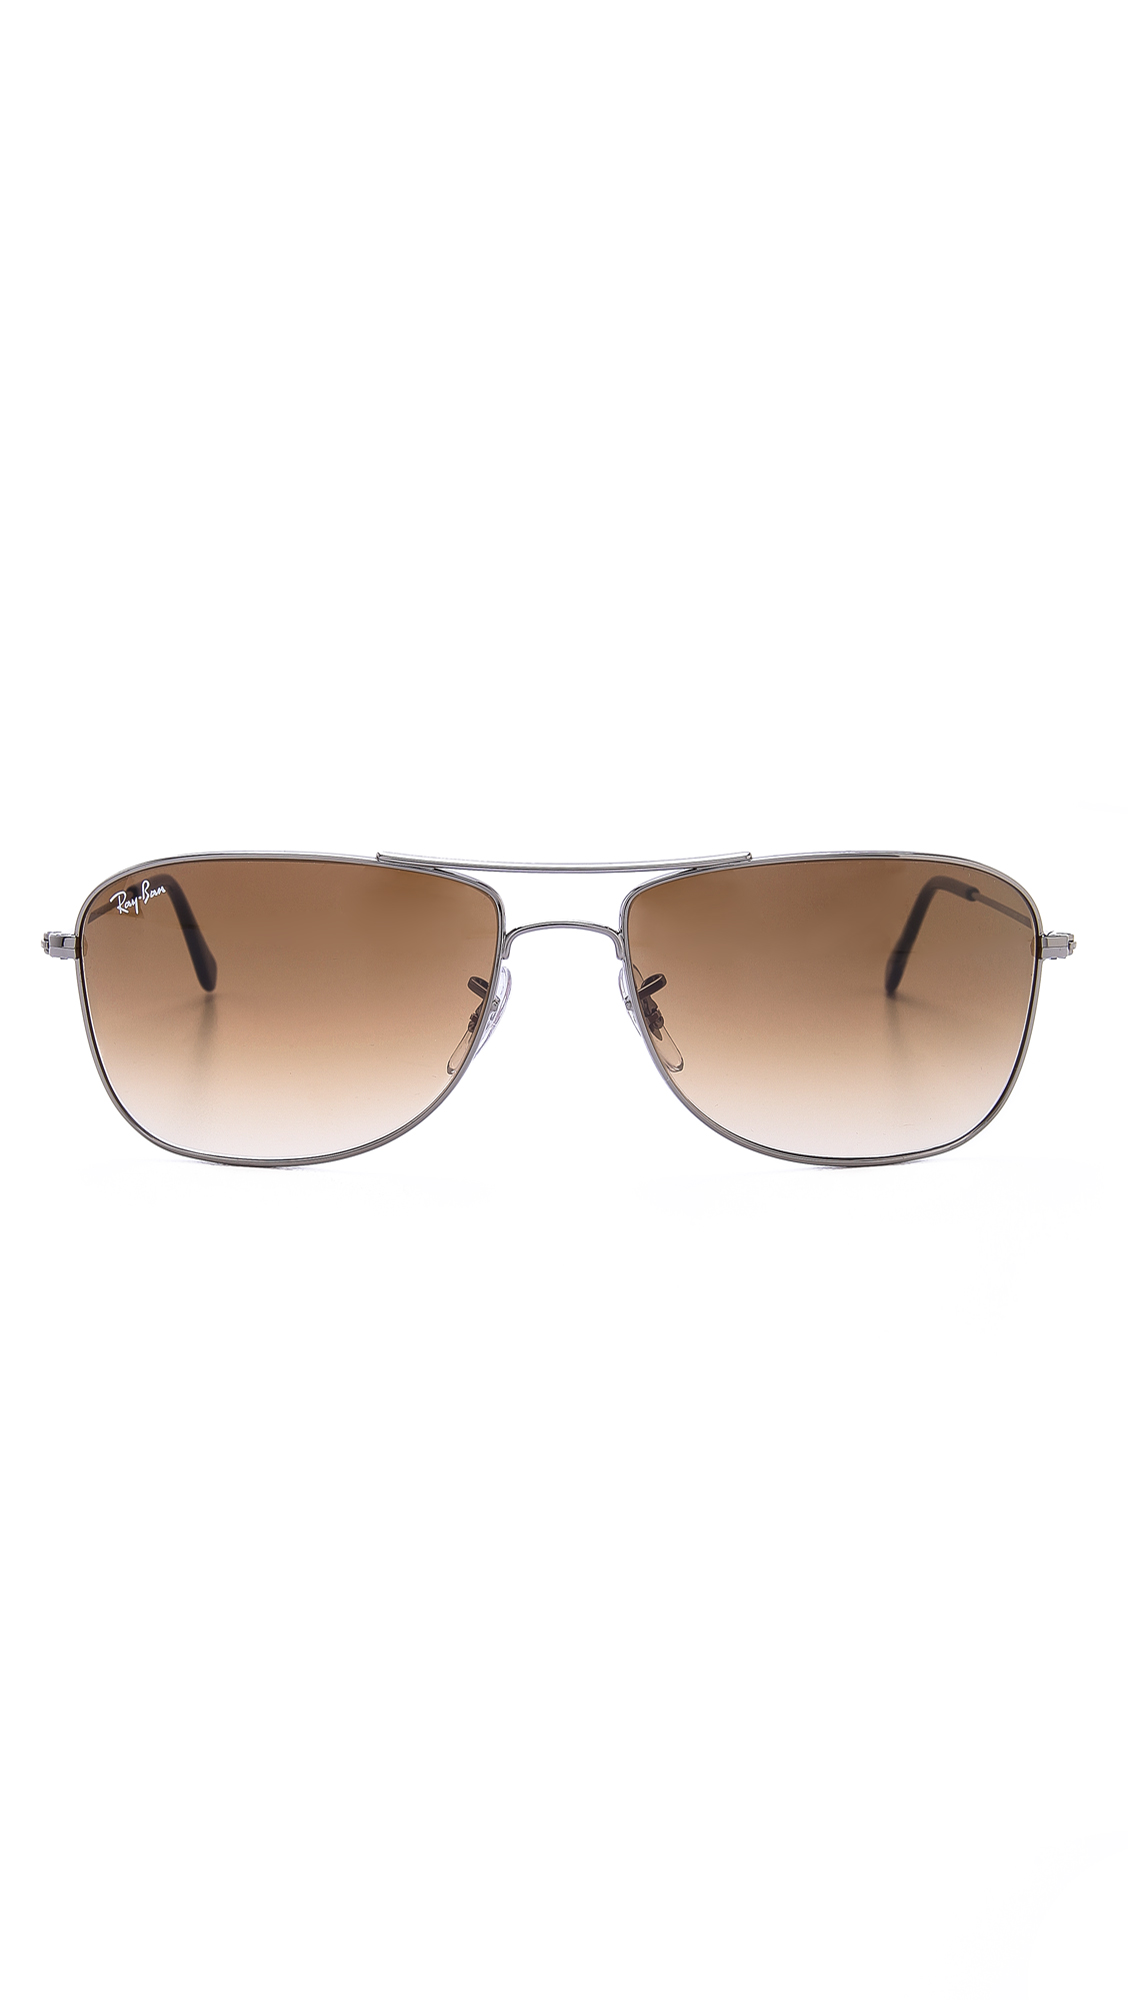 8ffd97e779 ... real lyst ray ban caravan sunglasses in gray for men aeda5 22833